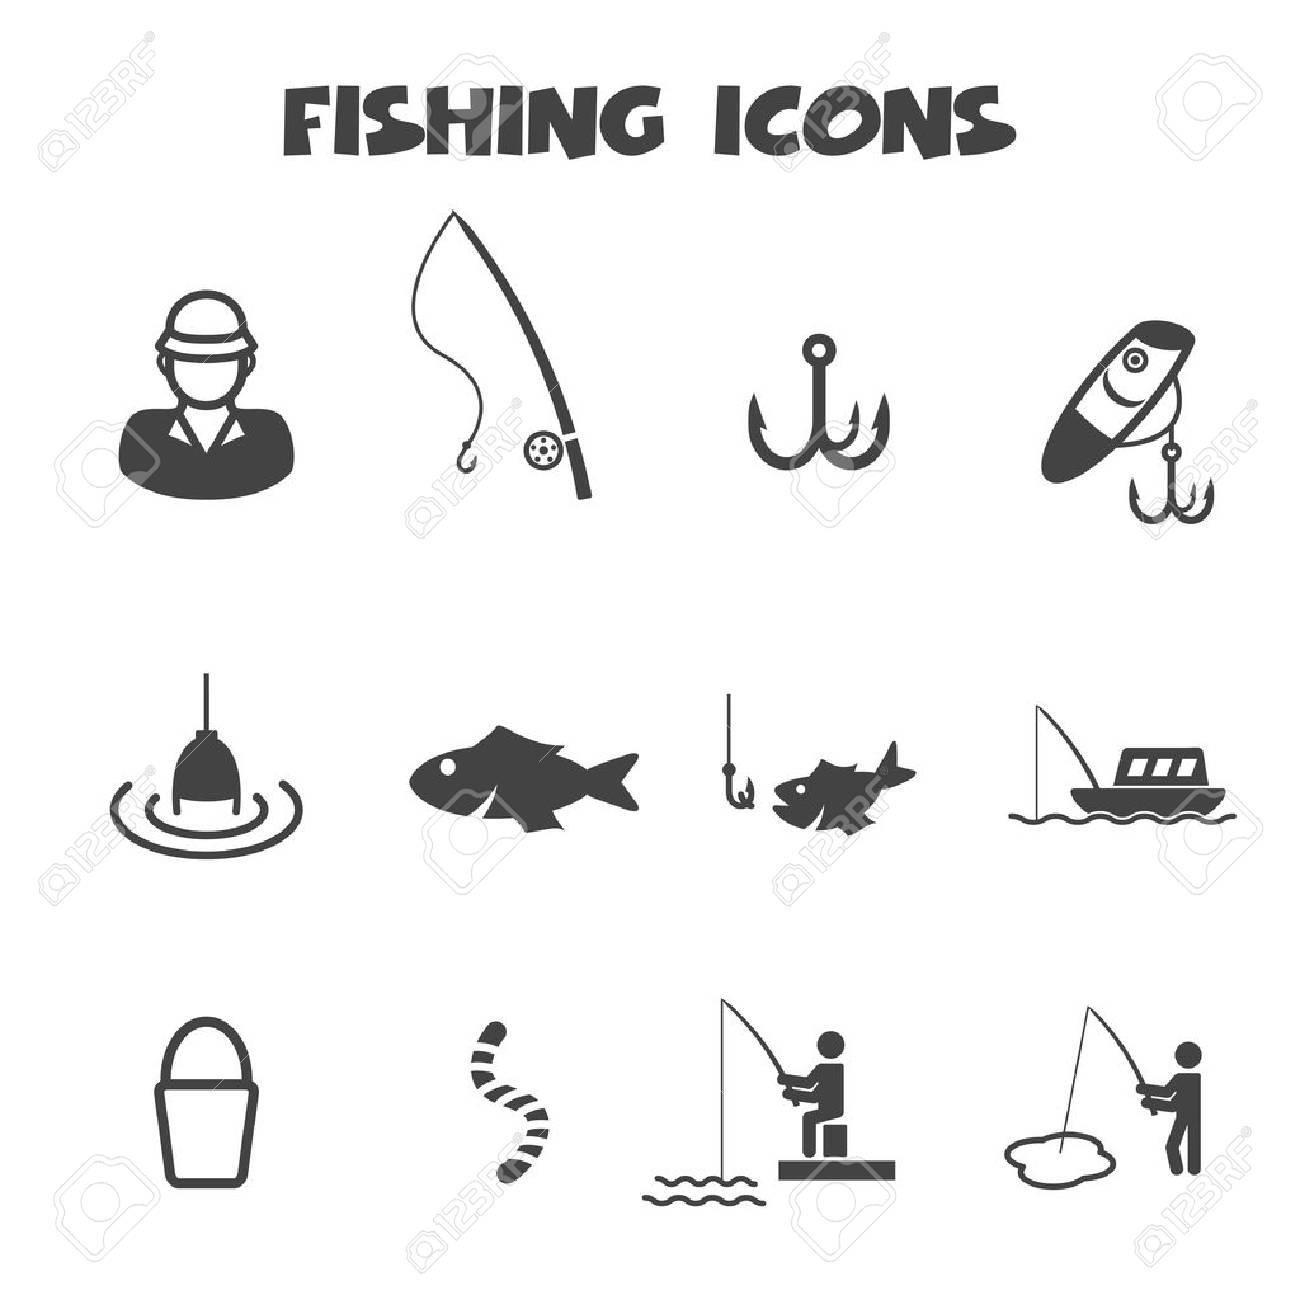 Fishing Icons Mono Vector Symbols Royalty Free Cliparts Vectors